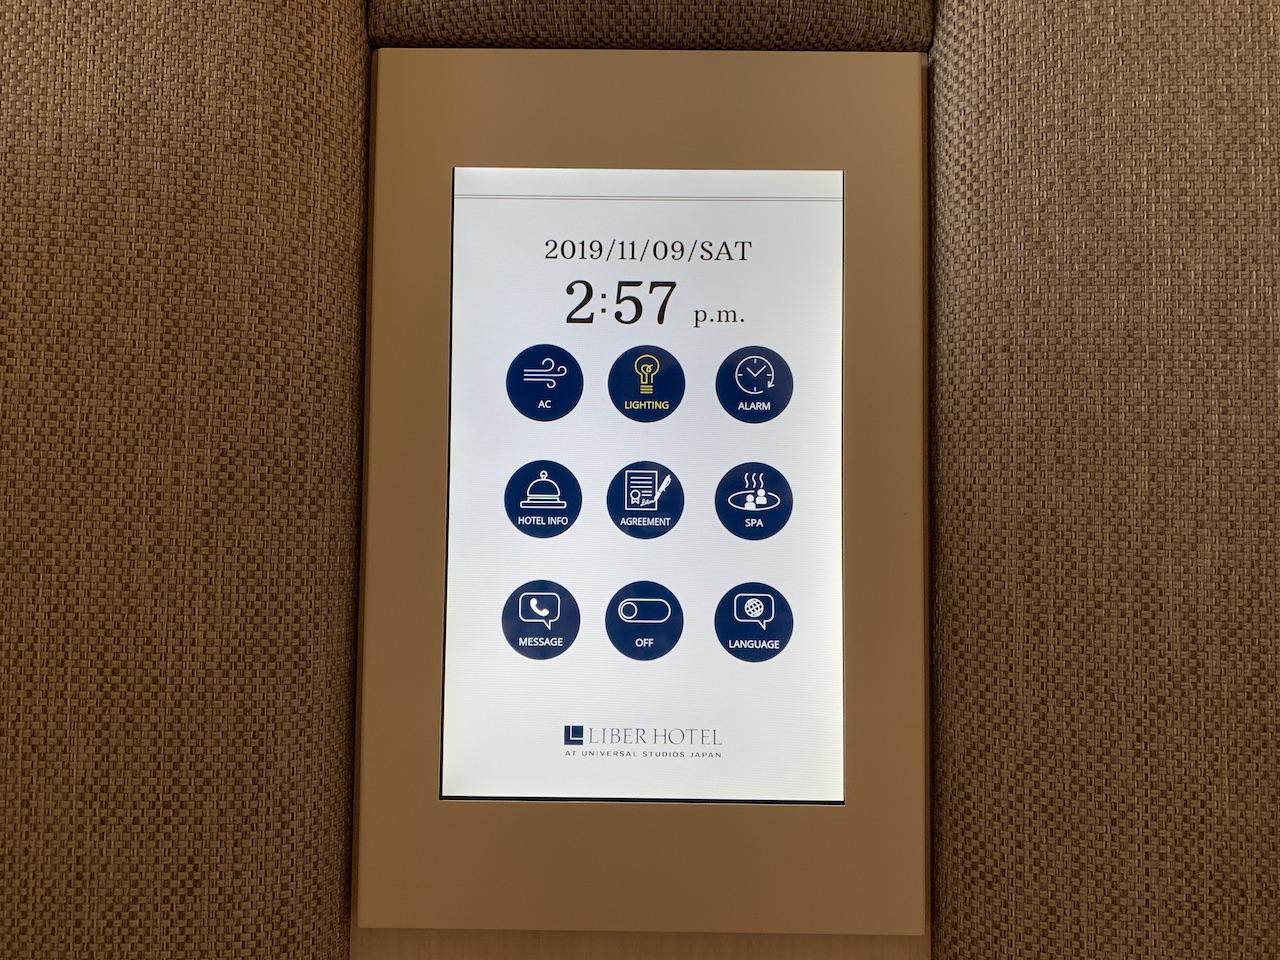 liber-hotel-usj-room-8